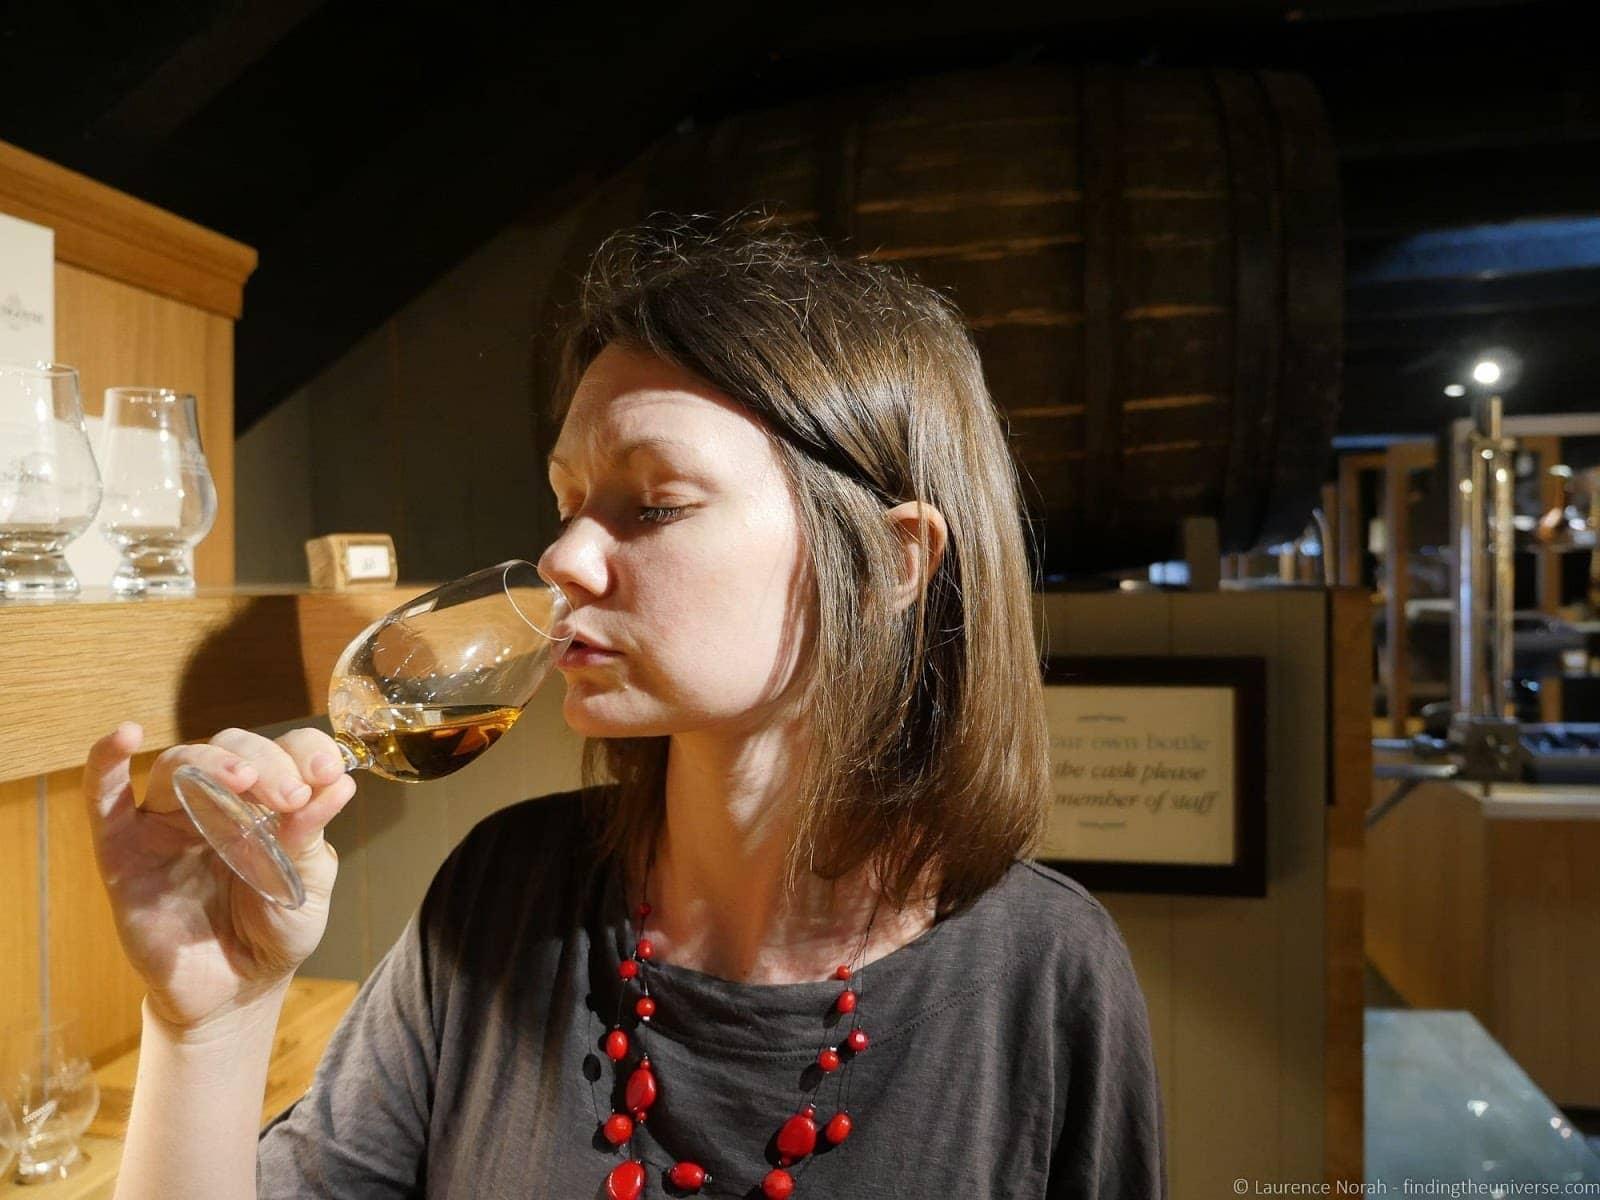 Jess drinking whisky